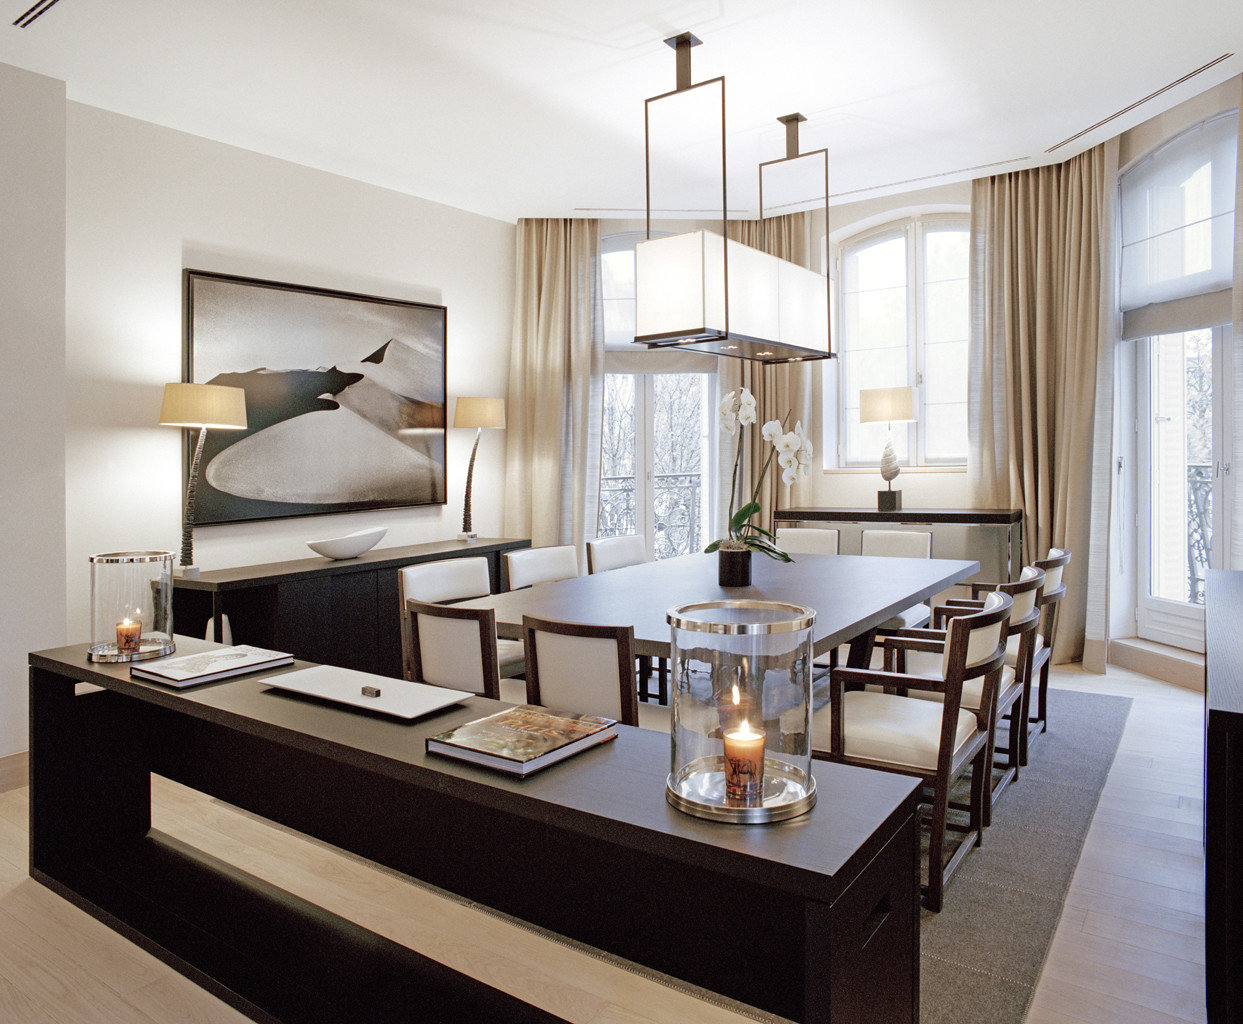 Boutique City Dining Elegant Luxury Suite property living room home lighting cabinetry Kitchen condominium